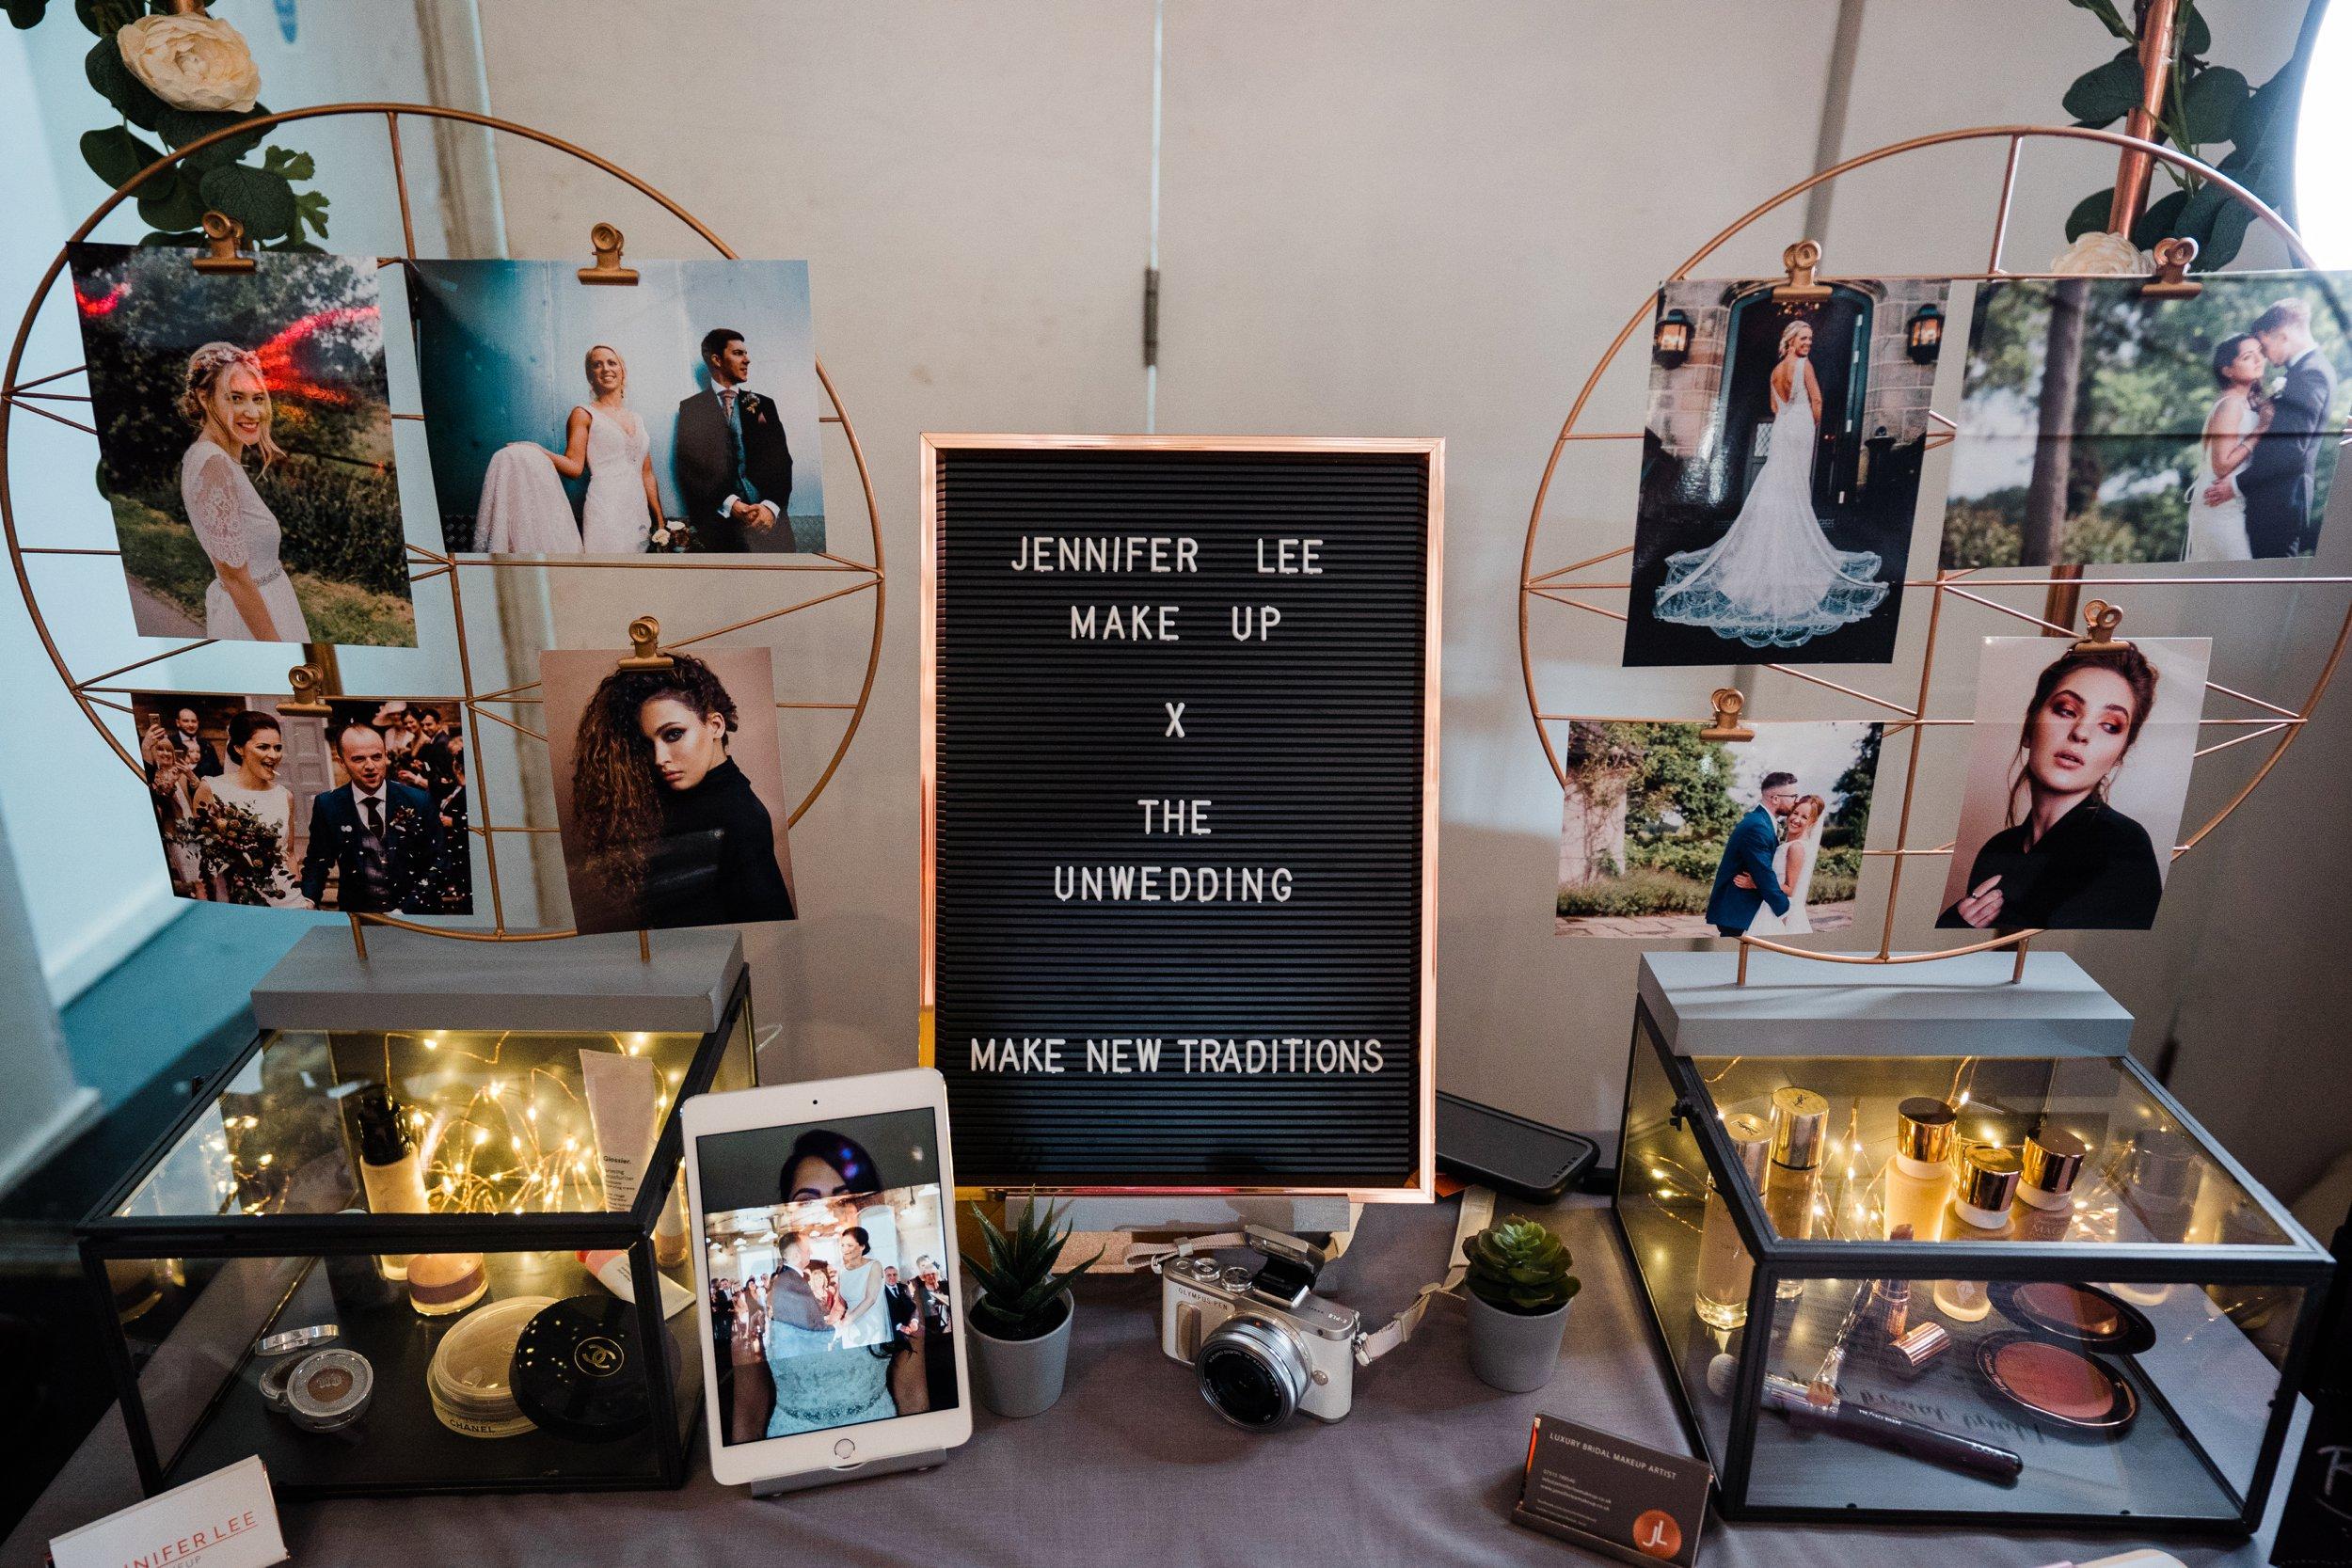 The UN-WEDDING SHOW 2019 cool bride style modern wedding fair Birmingham Fazeley Studios 00024.jpg